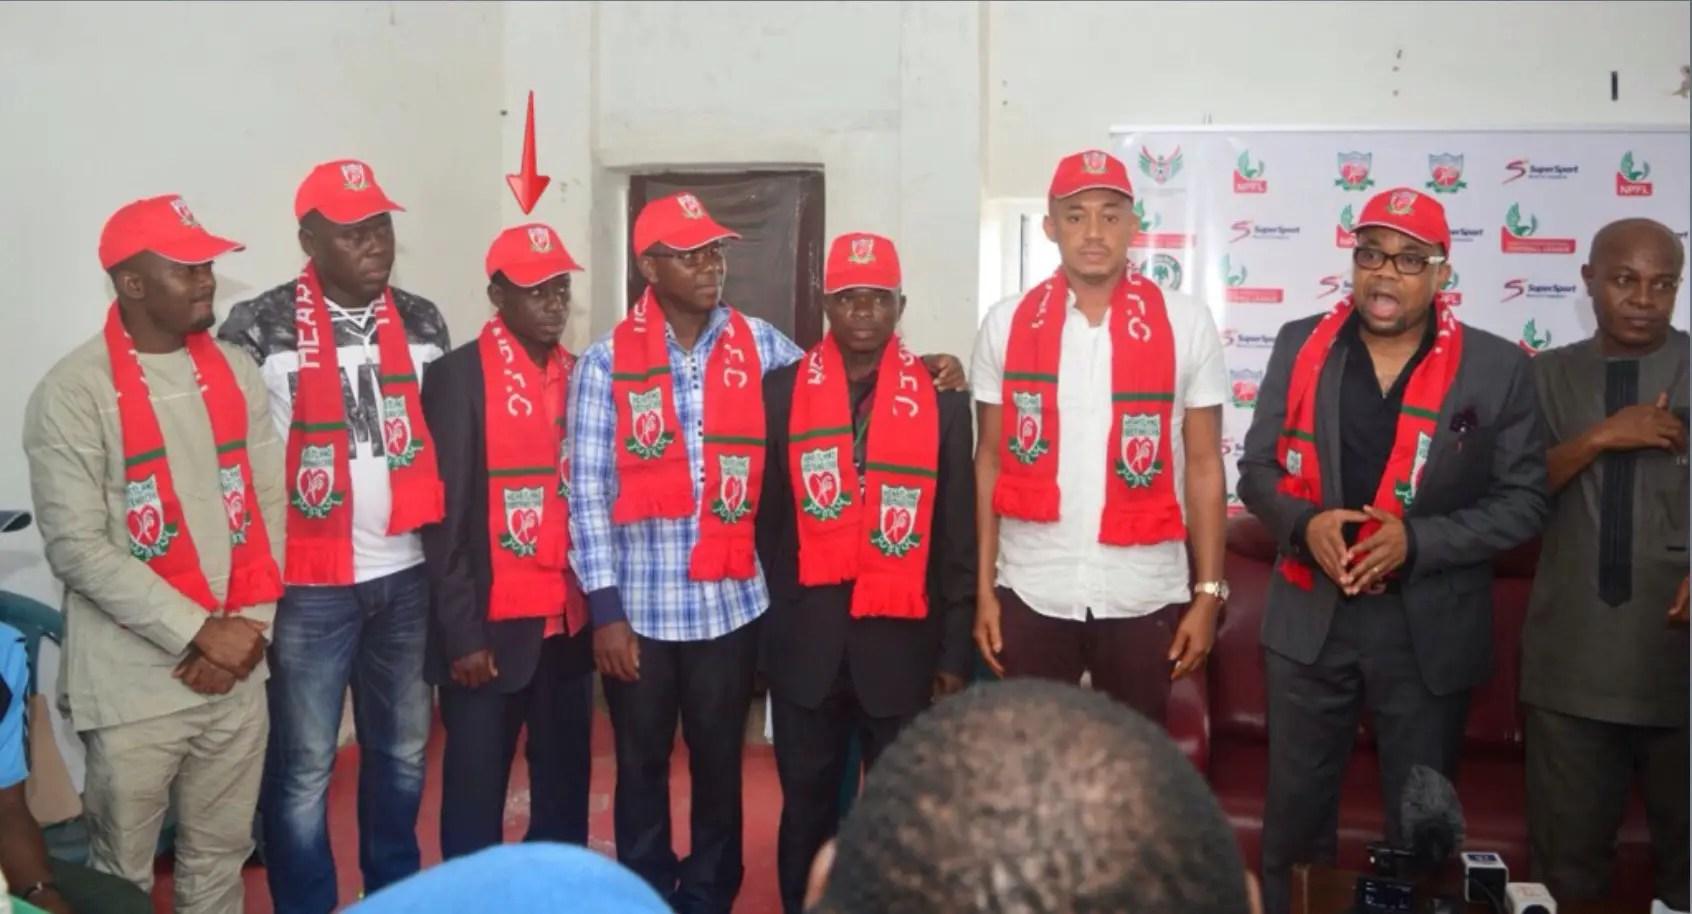 Mobi Oparaku Appointed Heartland Team Manager